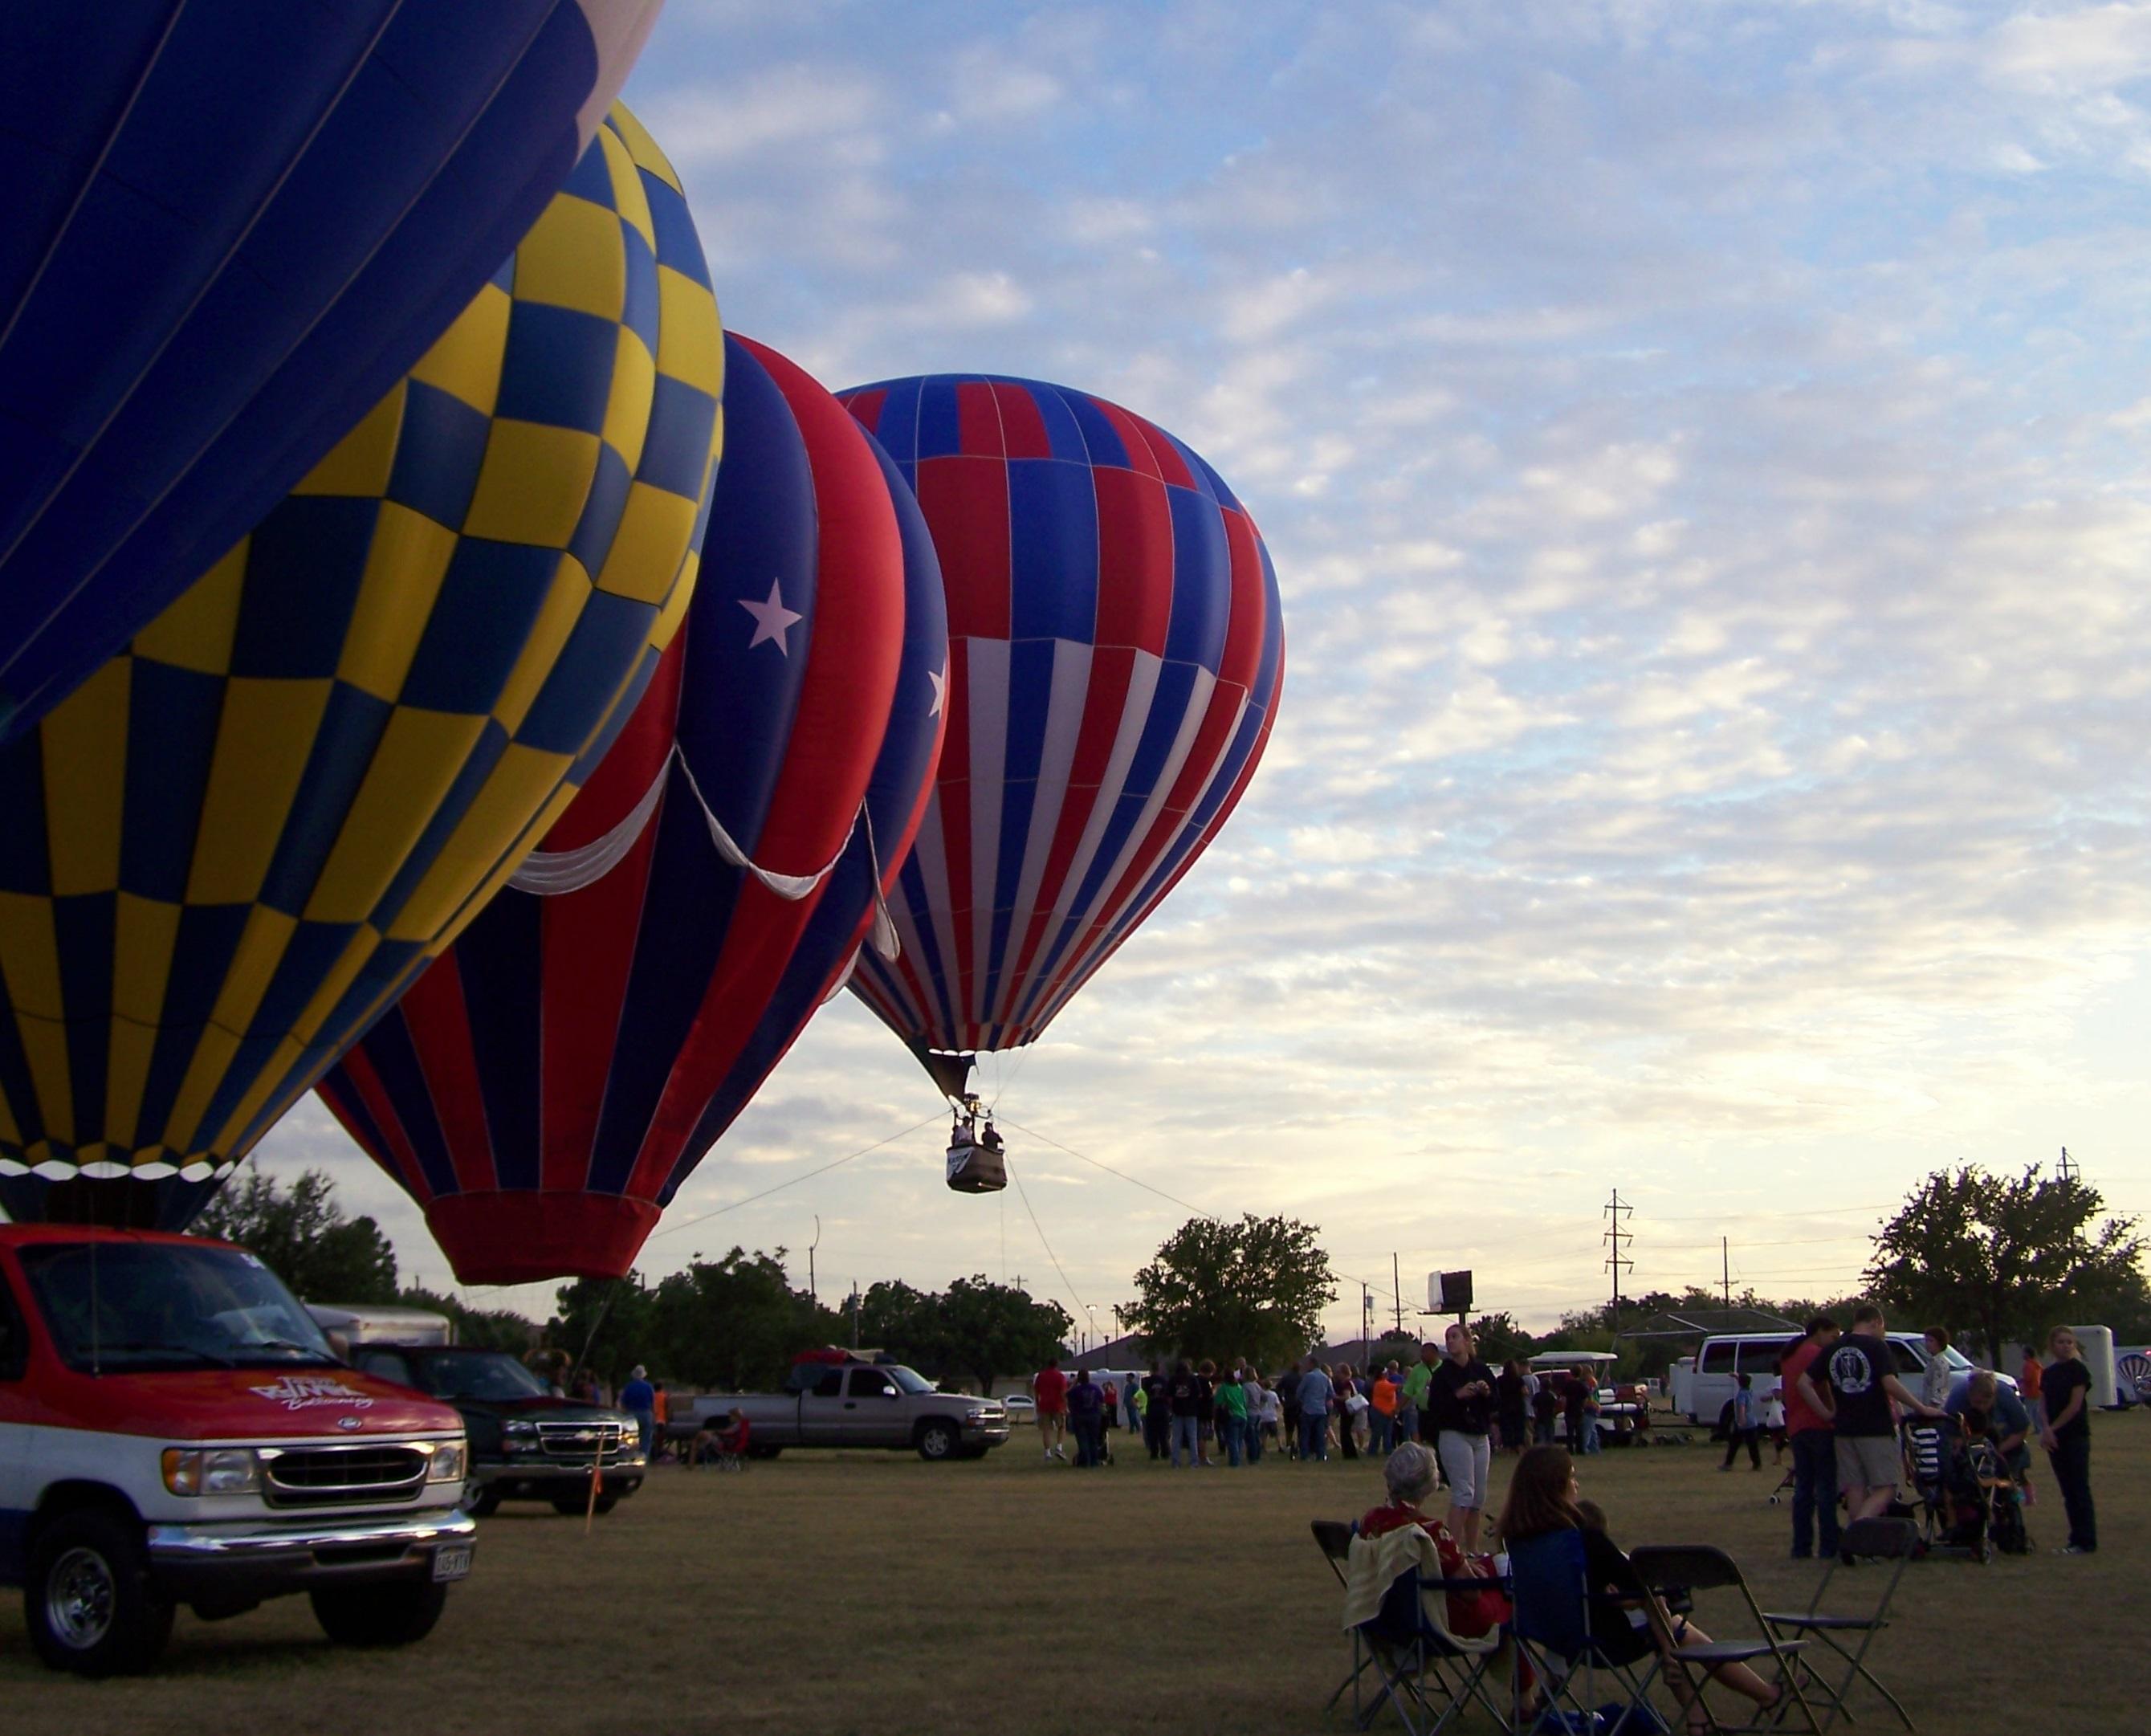 Sunset Sky at Balloonfest